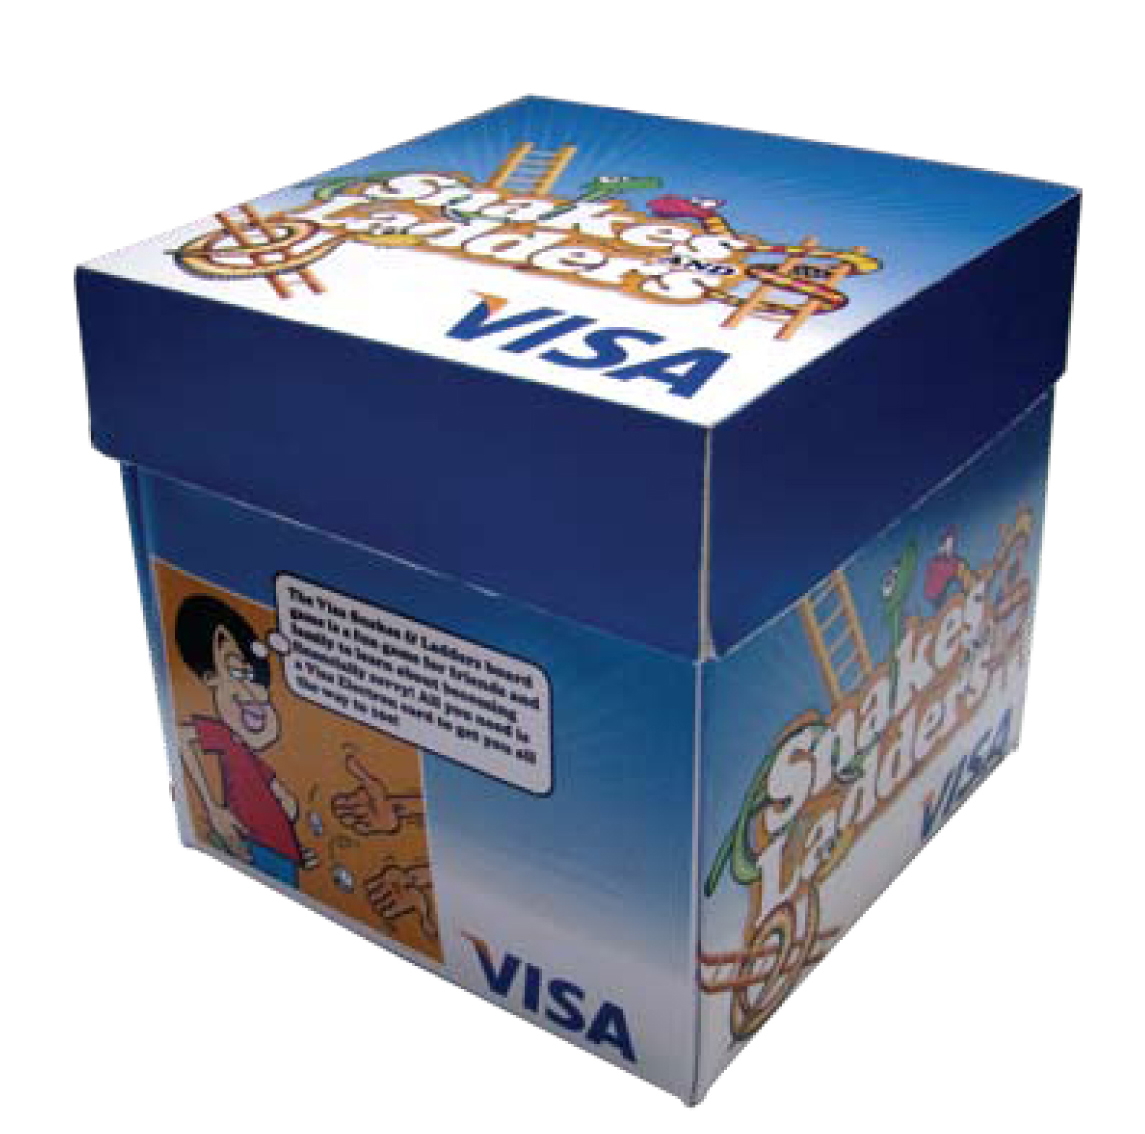 Visa box closed.jpg